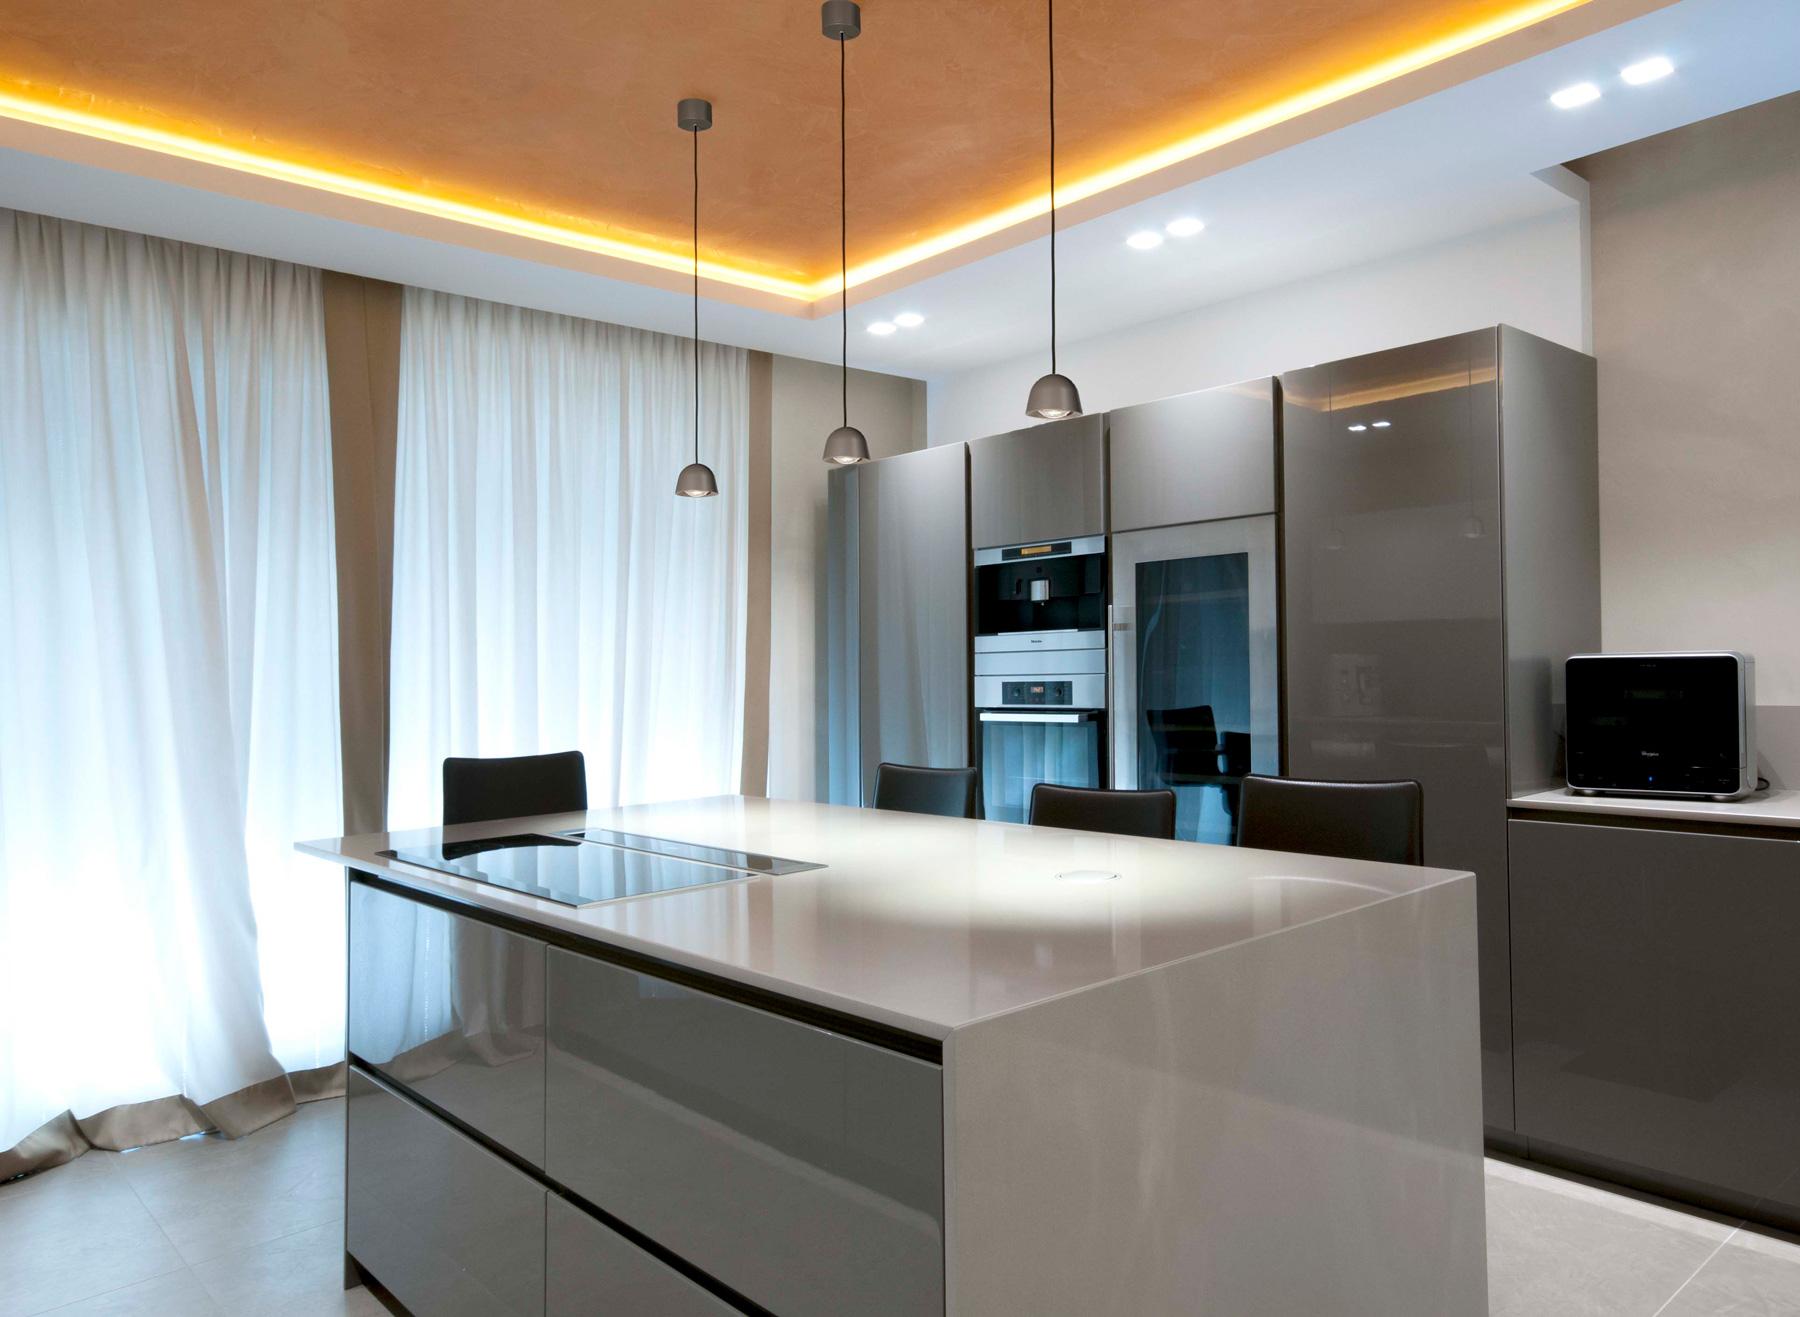 Cone lamper fra TAL i kjøkkenmiljø